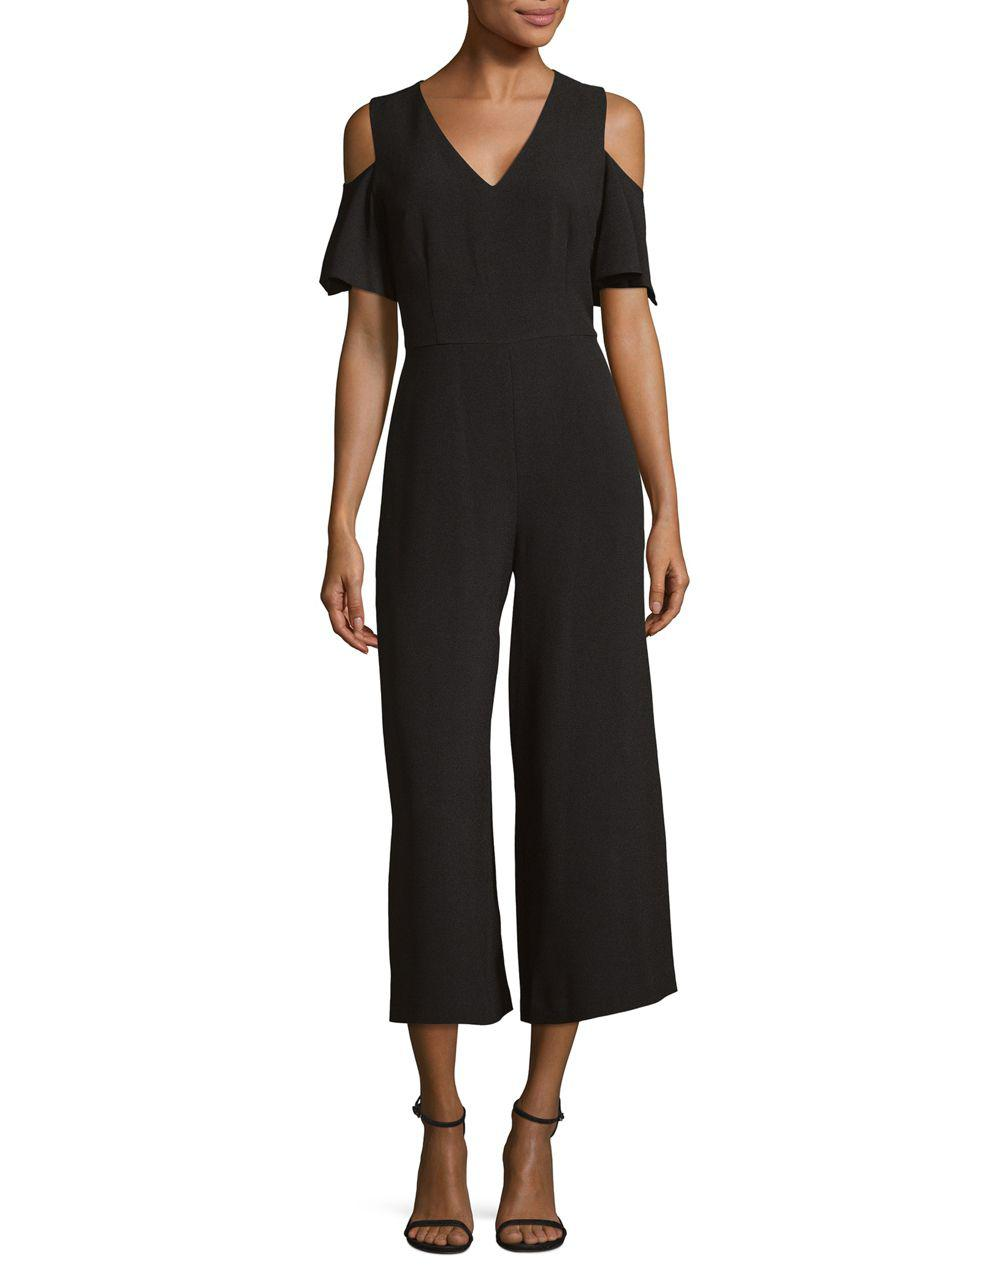 eb515bd312e9 Karl Lagerfeld Cold-shoulder Jumpsuit in Black - Save 9% - Lyst